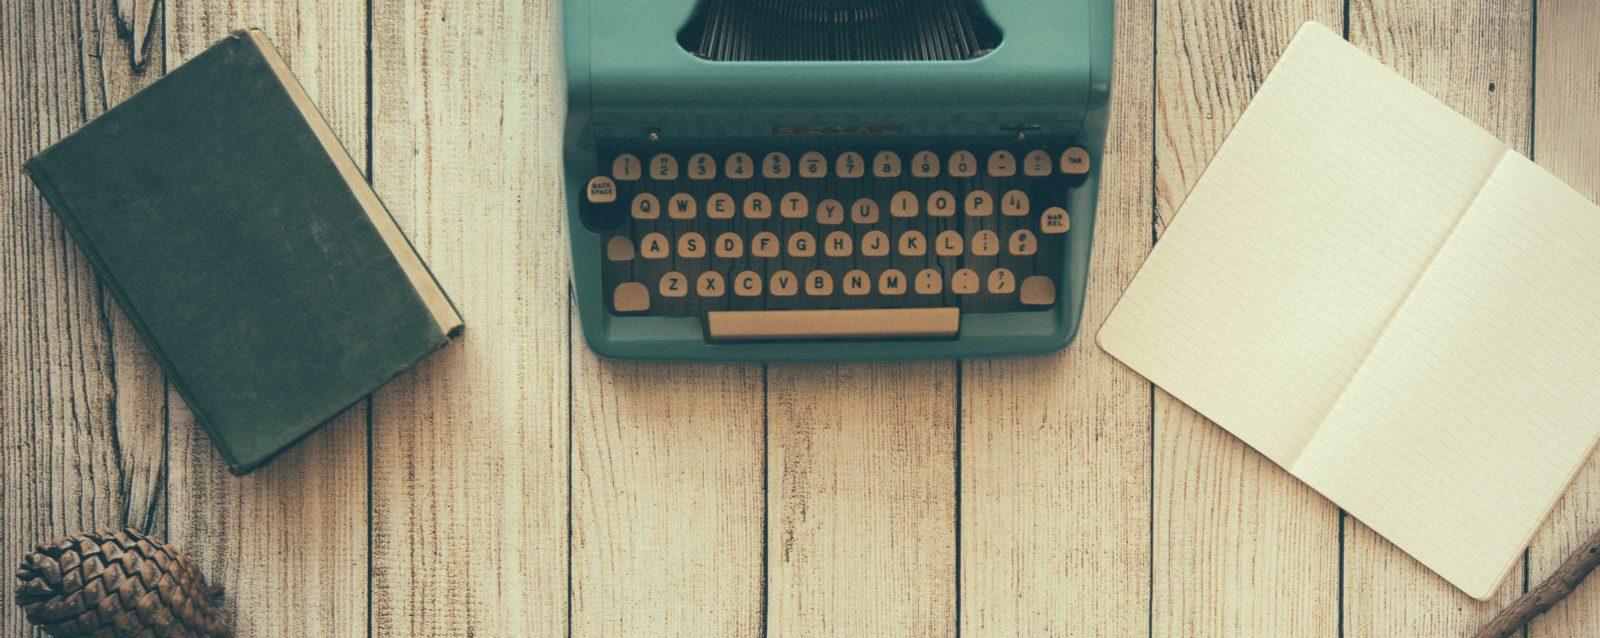 Typewriter - Academic CV Workshop